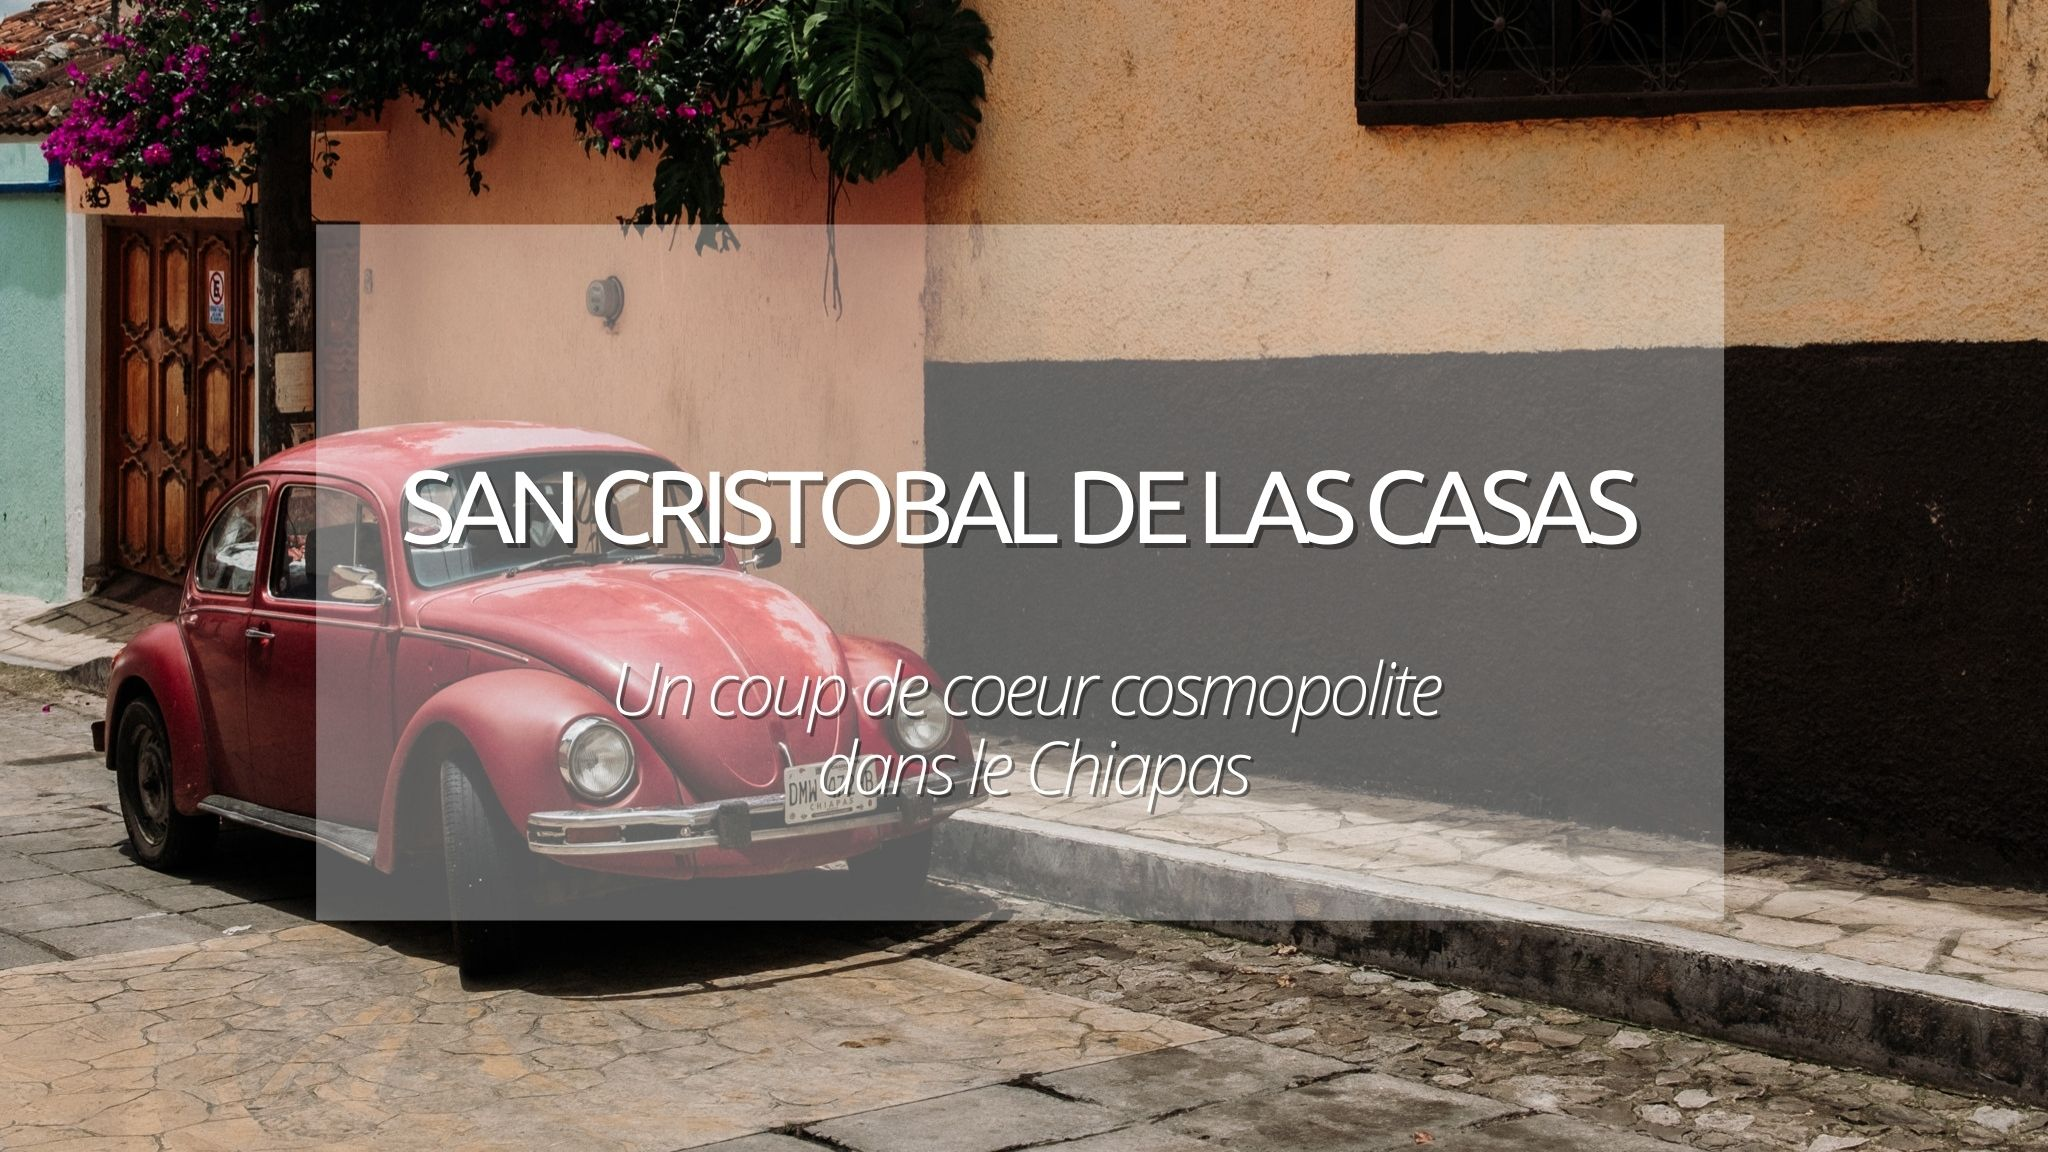 Visiter San Cristobal de las Casas : coup de coeur cosmopolite du Chiapas